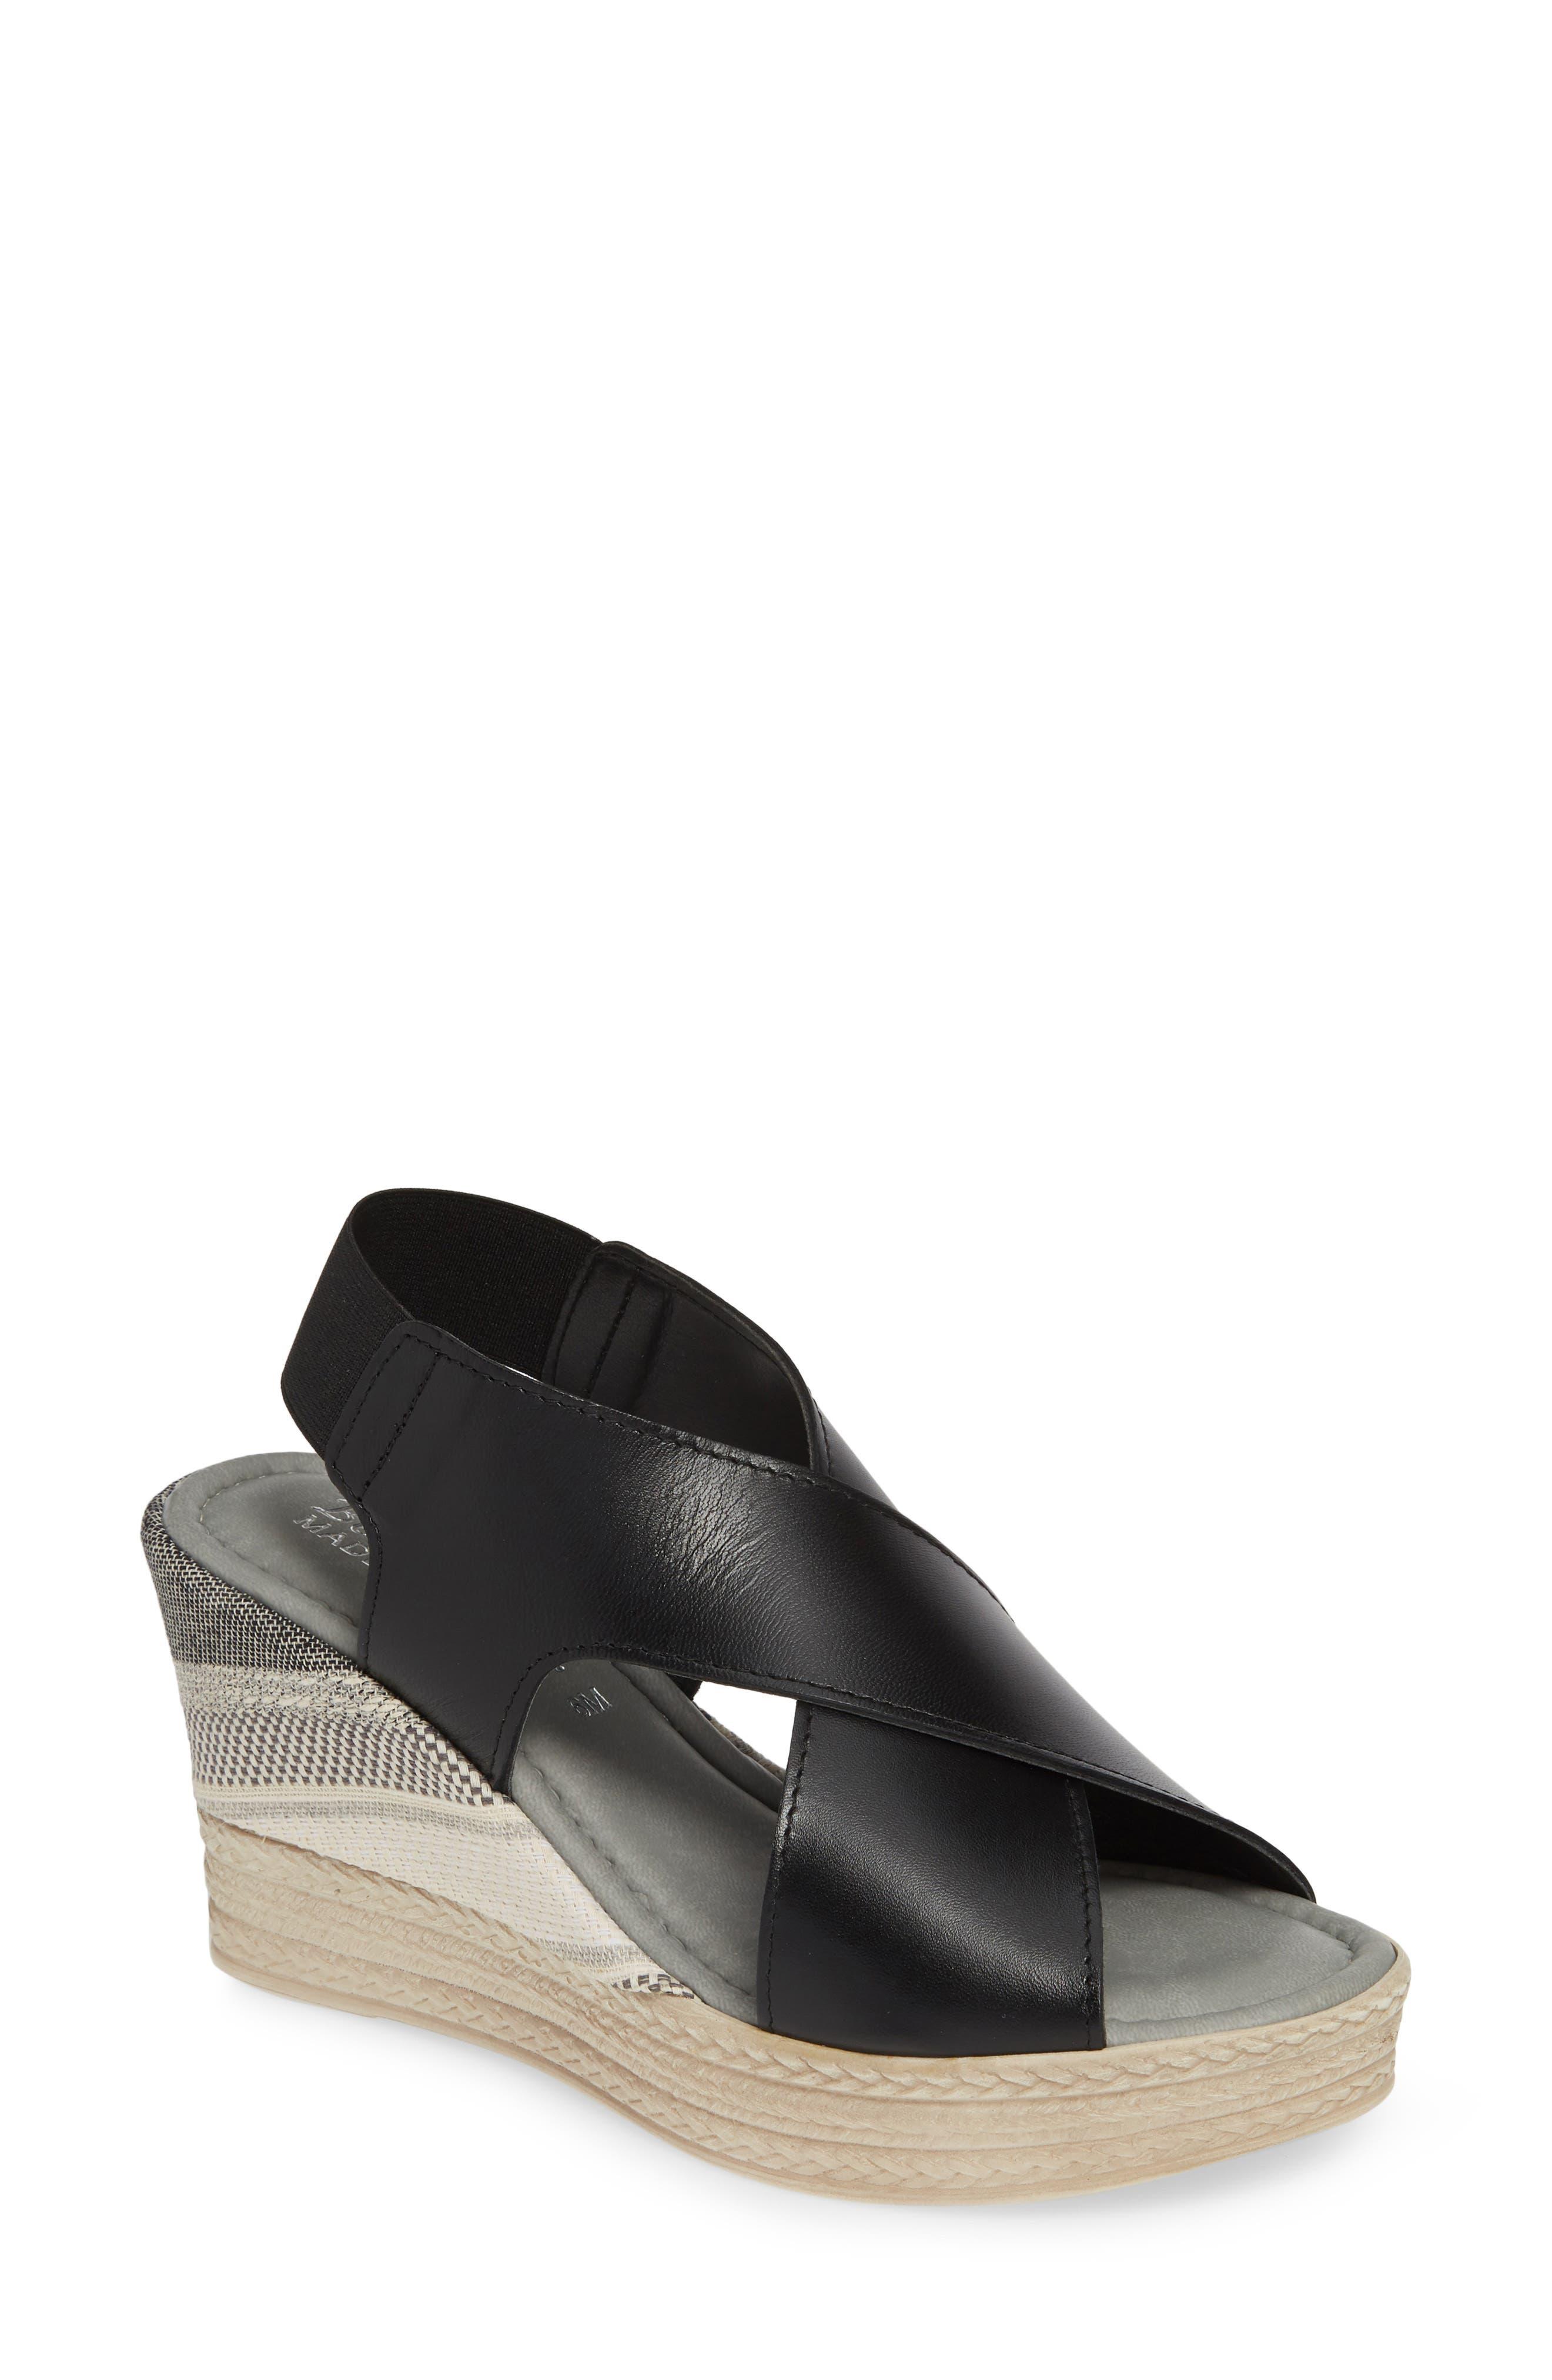 BELLA VITA, Slingback Sandal, Main thumbnail 1, color, BLACK ITALIAN LEATHER